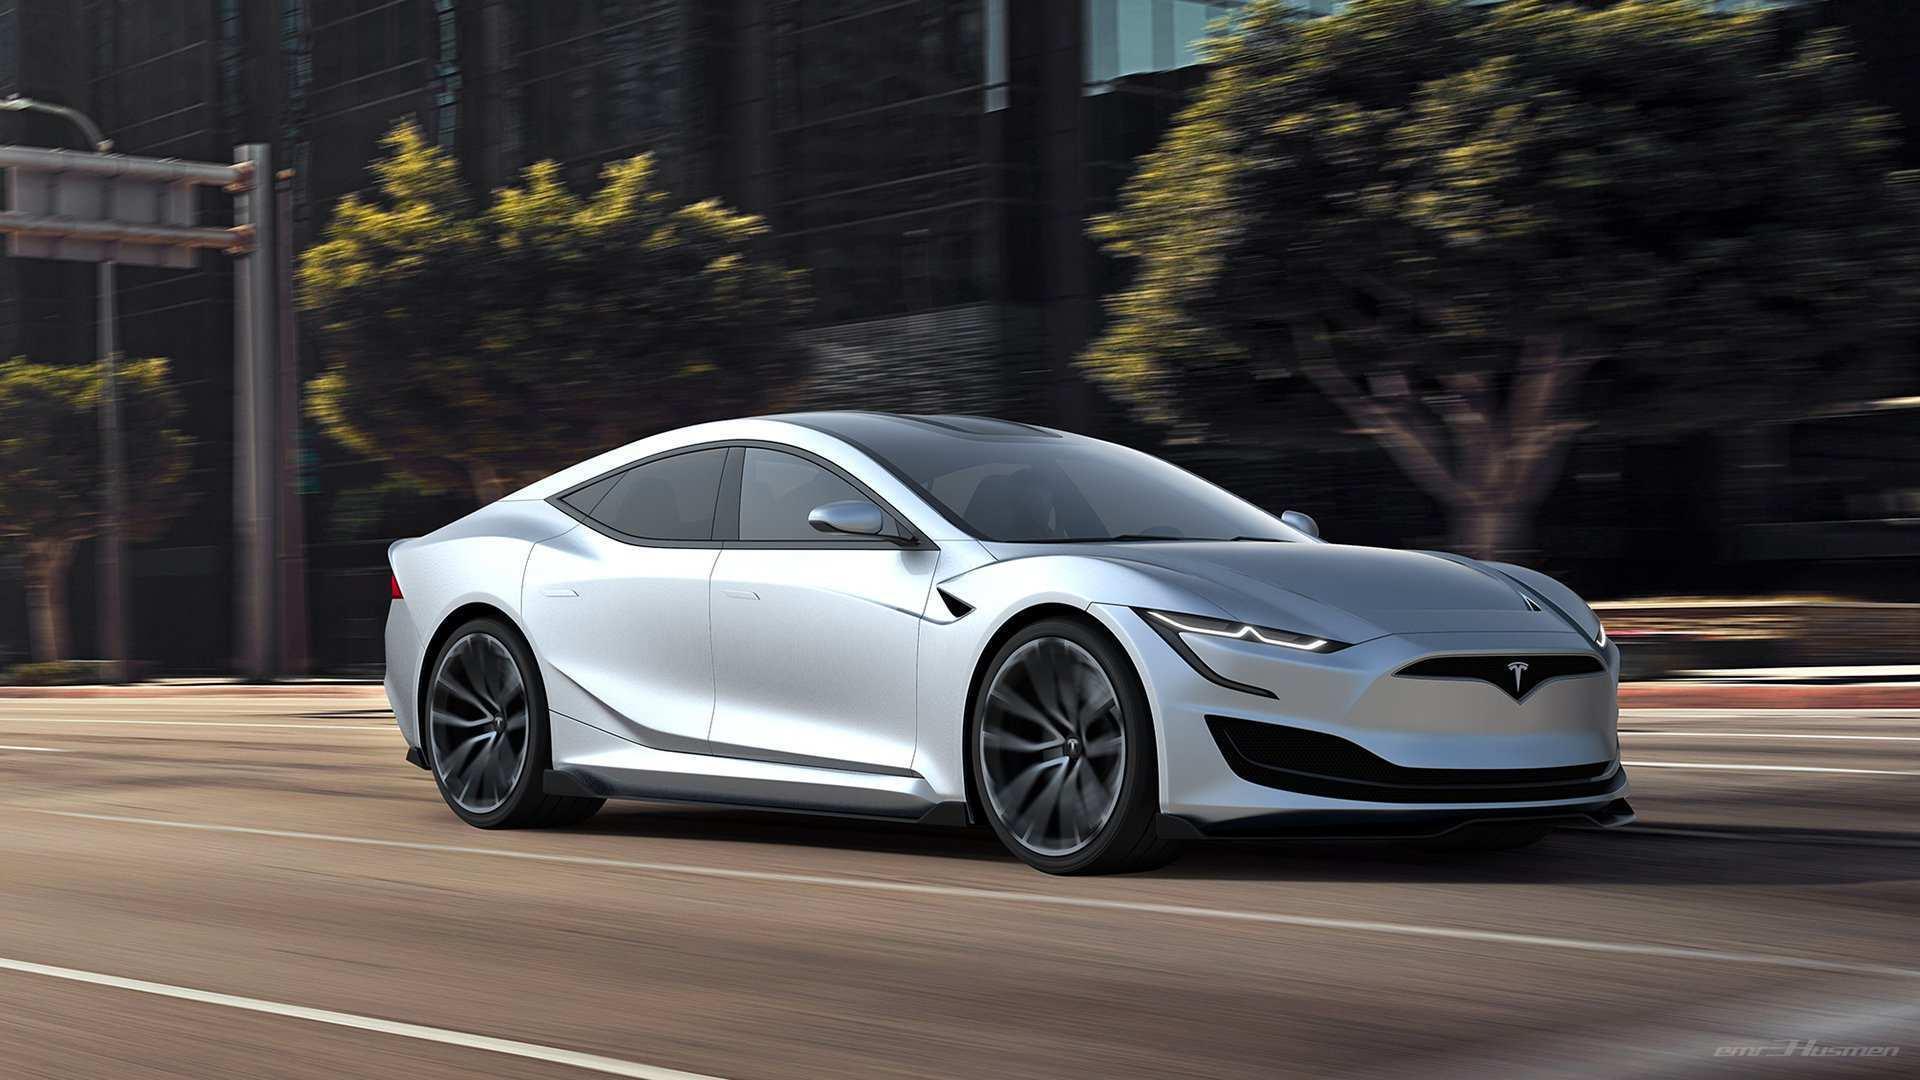 93 Best Review 2020 Tesla Model S Specs for 2020 Tesla Model S